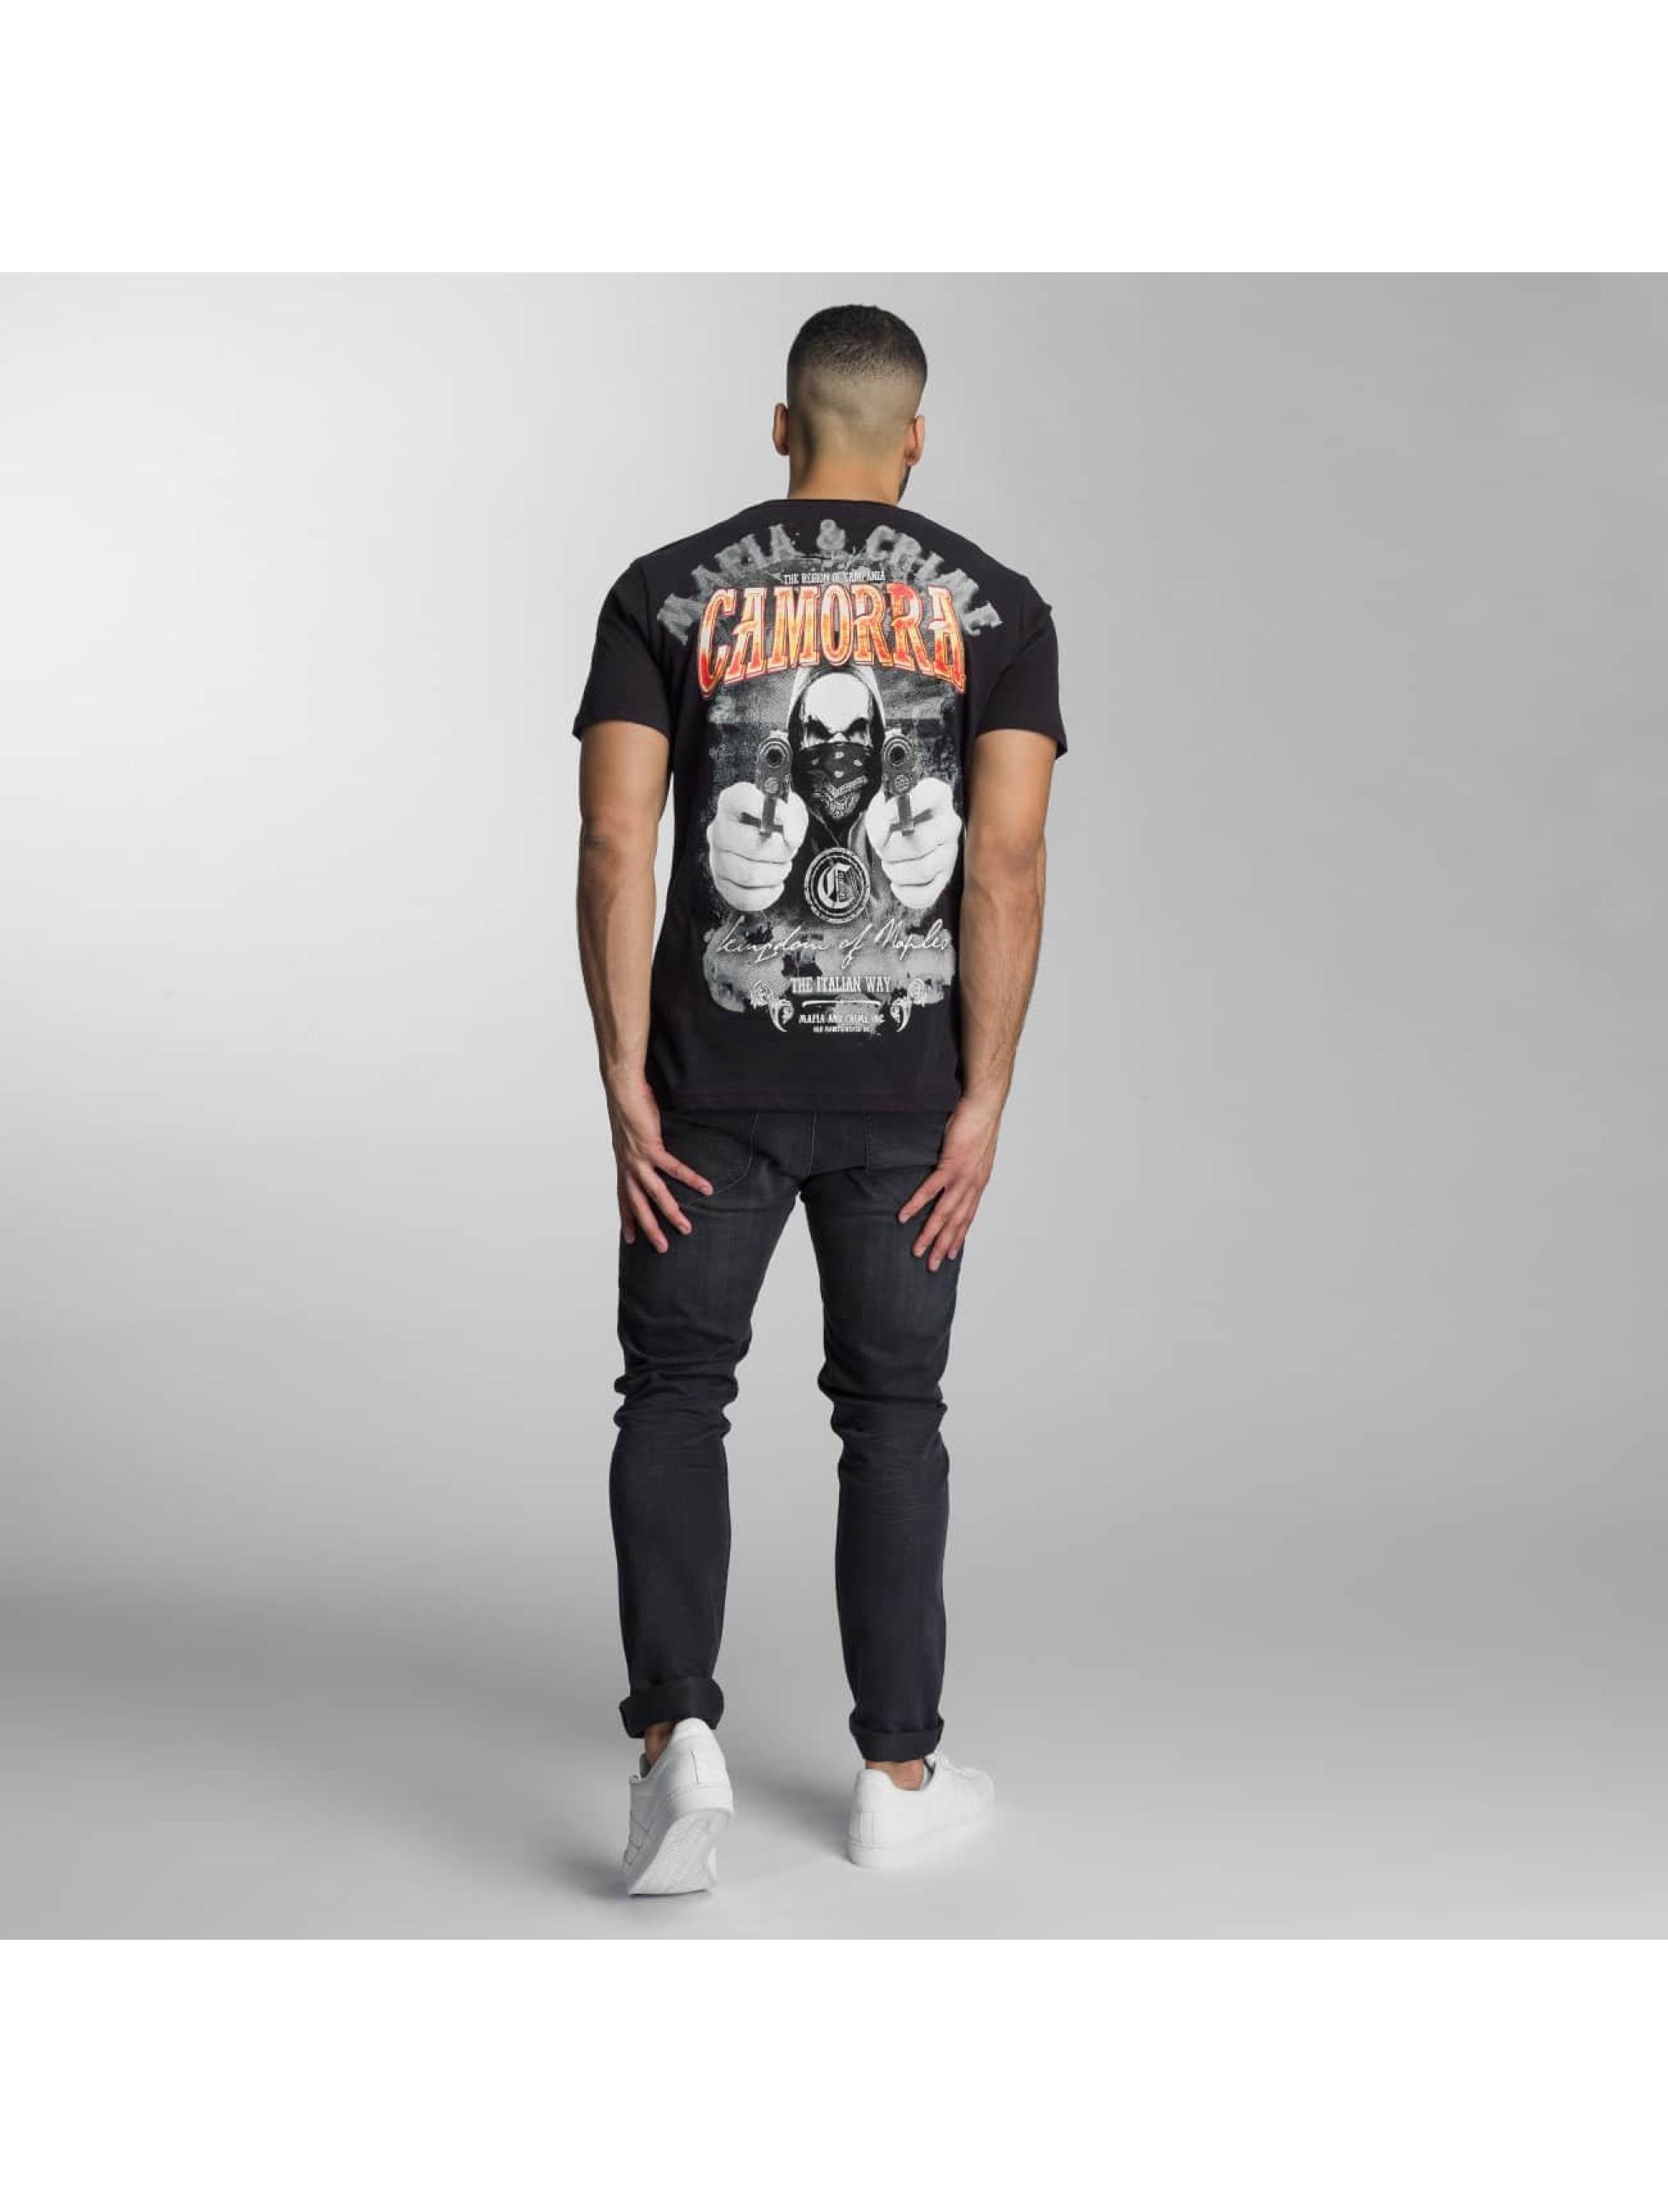 Mafia & Crime T-Shirt Camorra schwarz